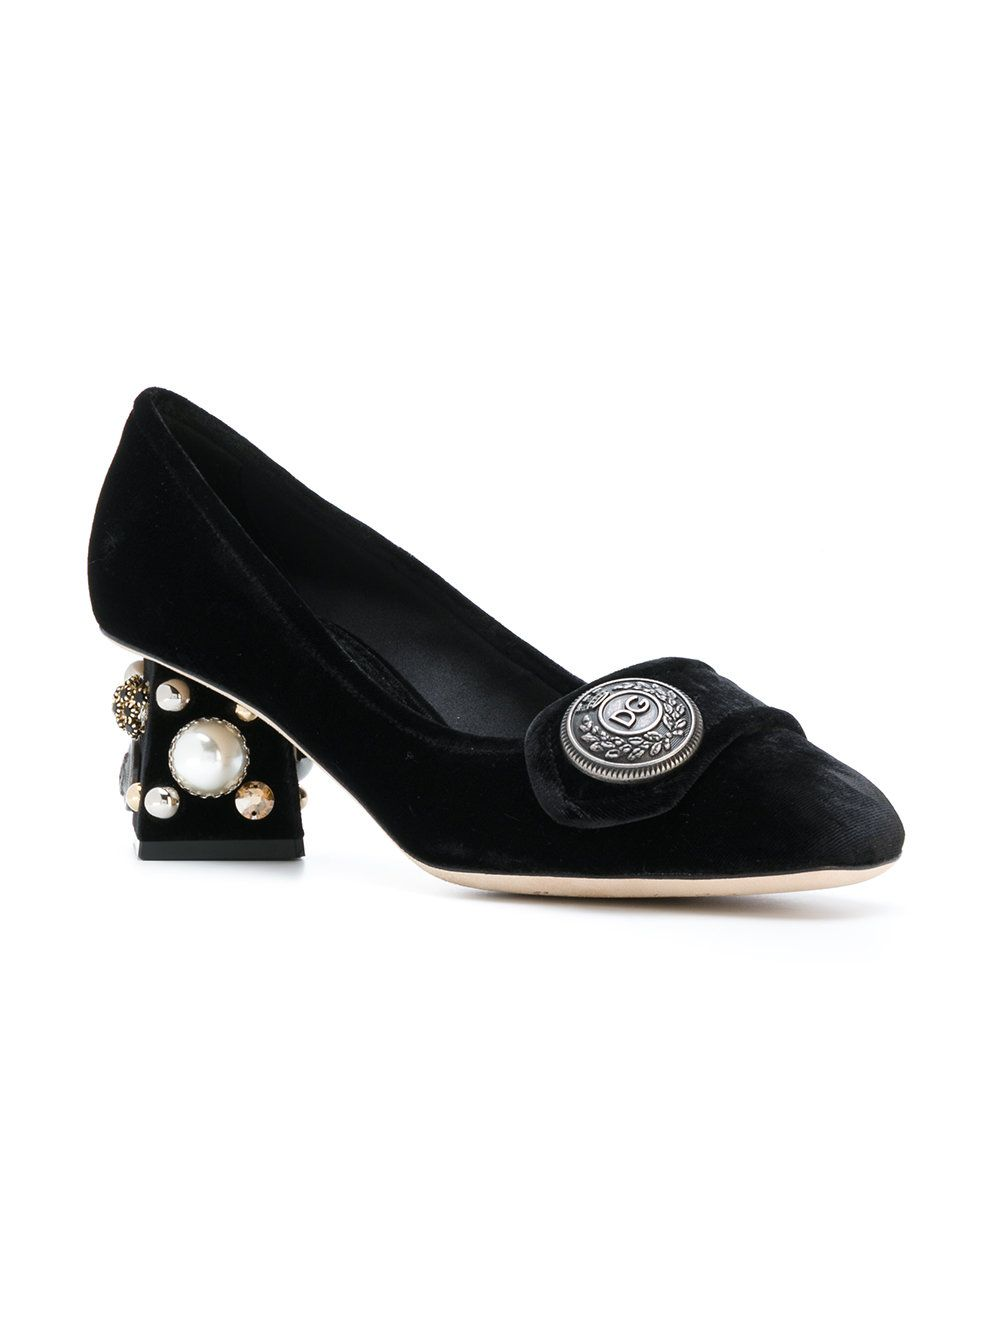 3982867940ac Dolce & Gabbana Jackie Pumps - Farfetch | shoes Dolce Gabbana- Gucci ...